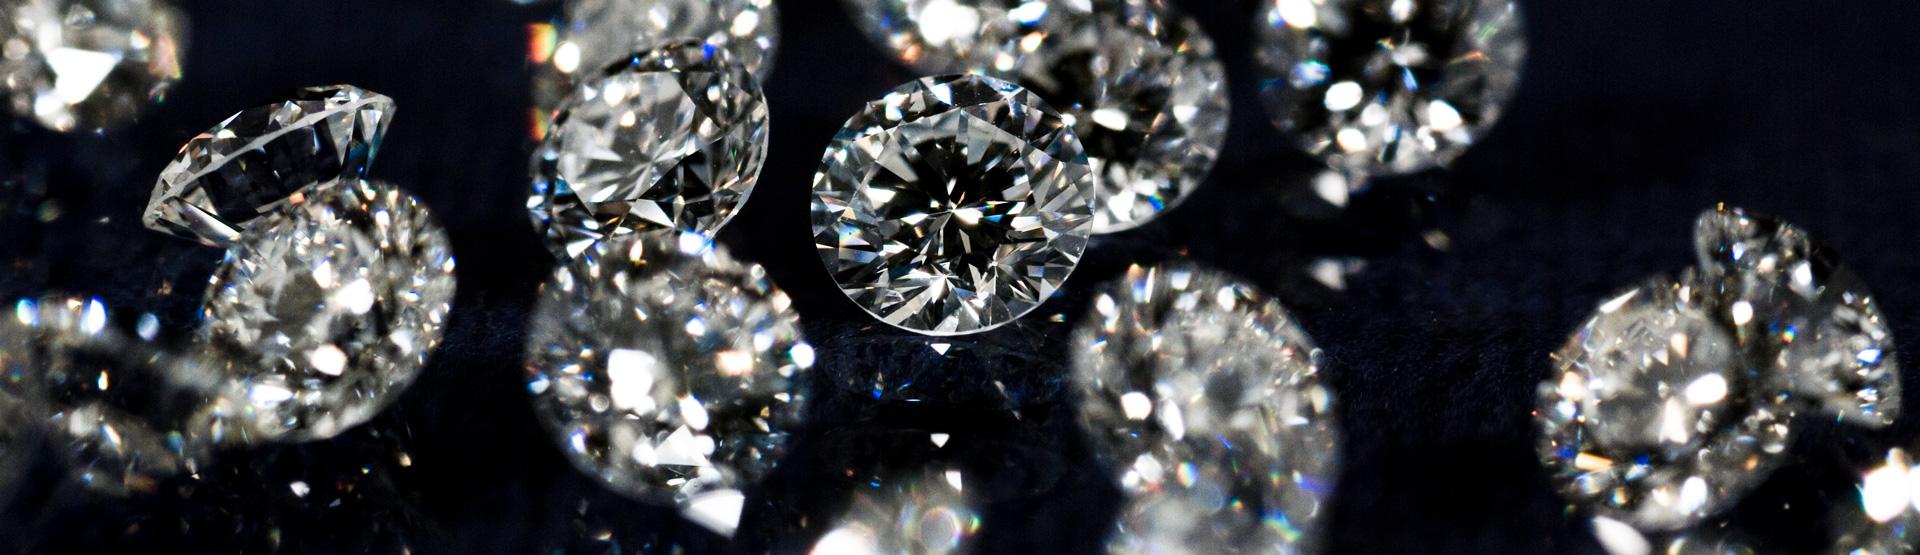 Diamanten von Juwelier Gygax Aarau